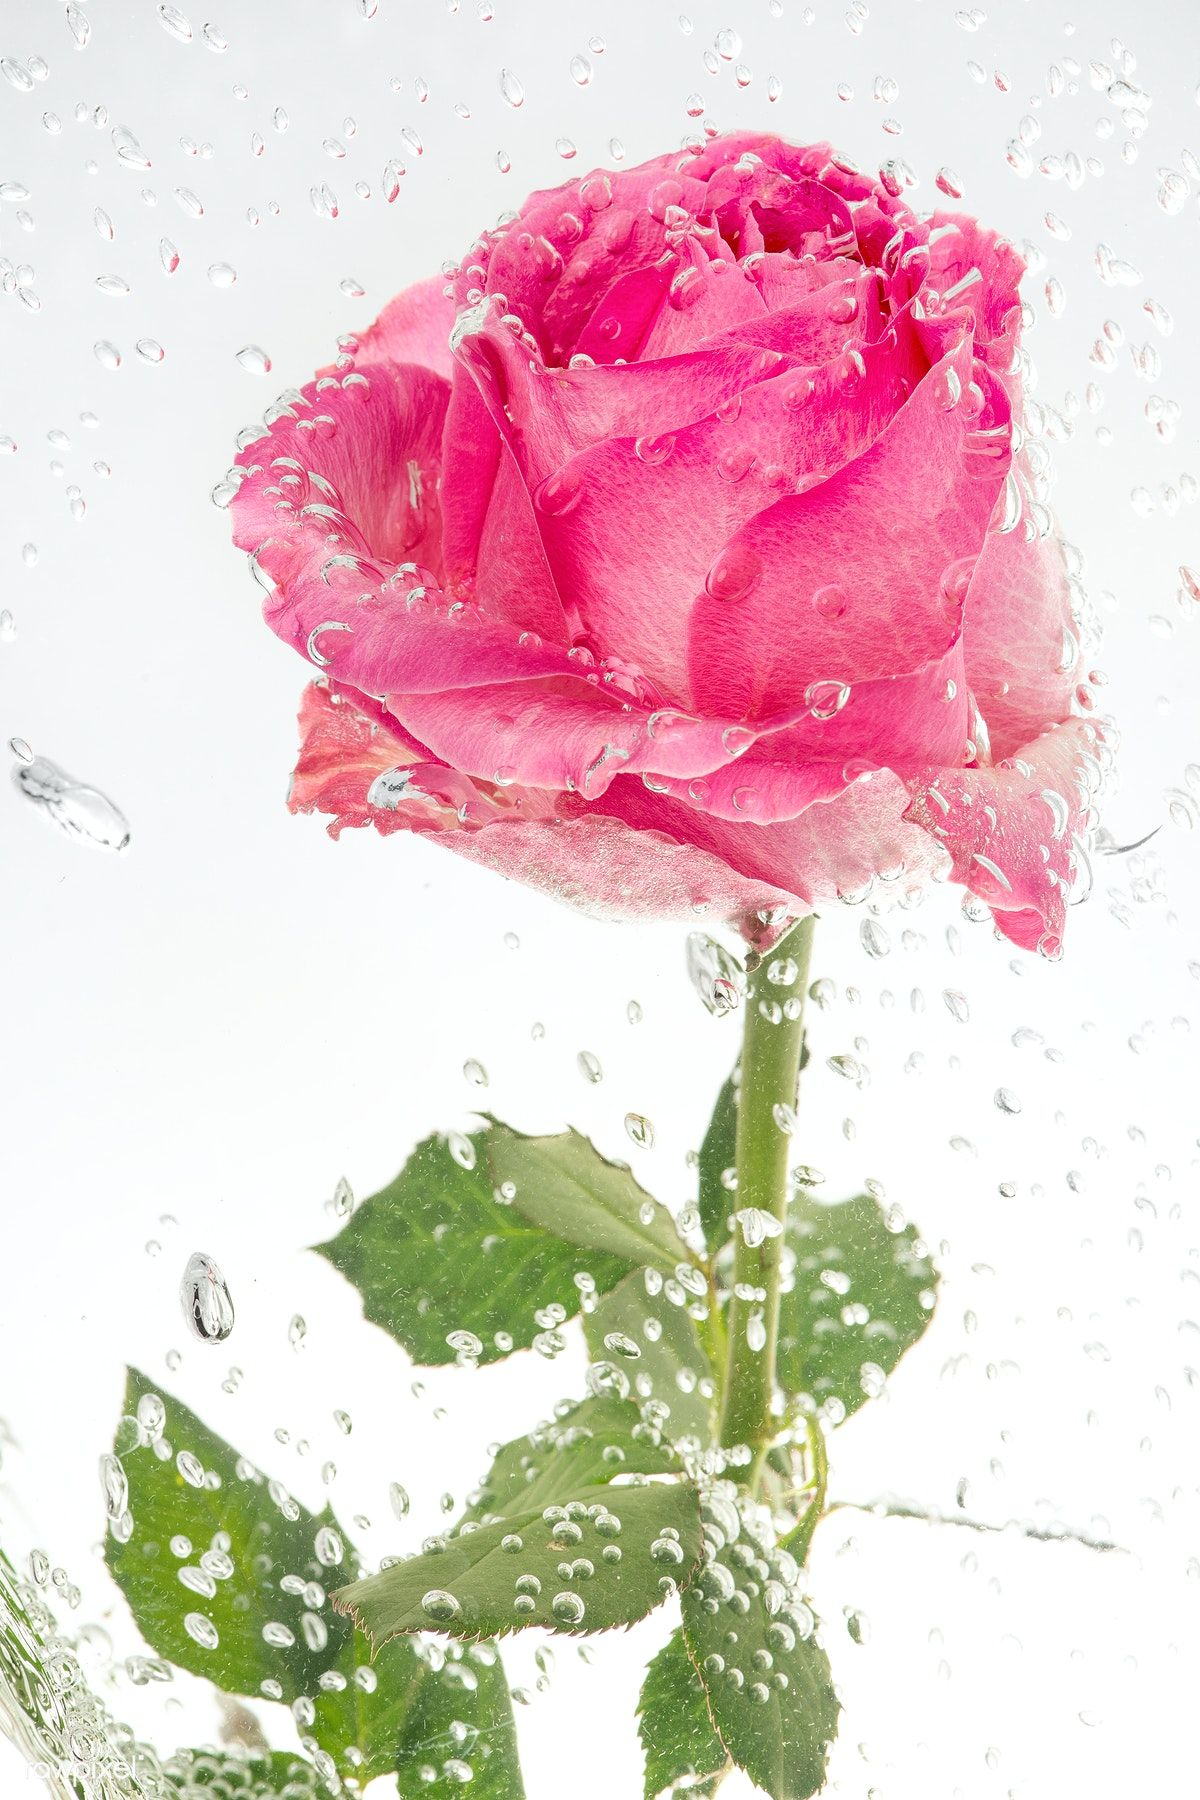 Download Premium Image Of Pink Blooming Rose Flower 2271228 In 2020 Blooming Rose Rose Flower Flowers